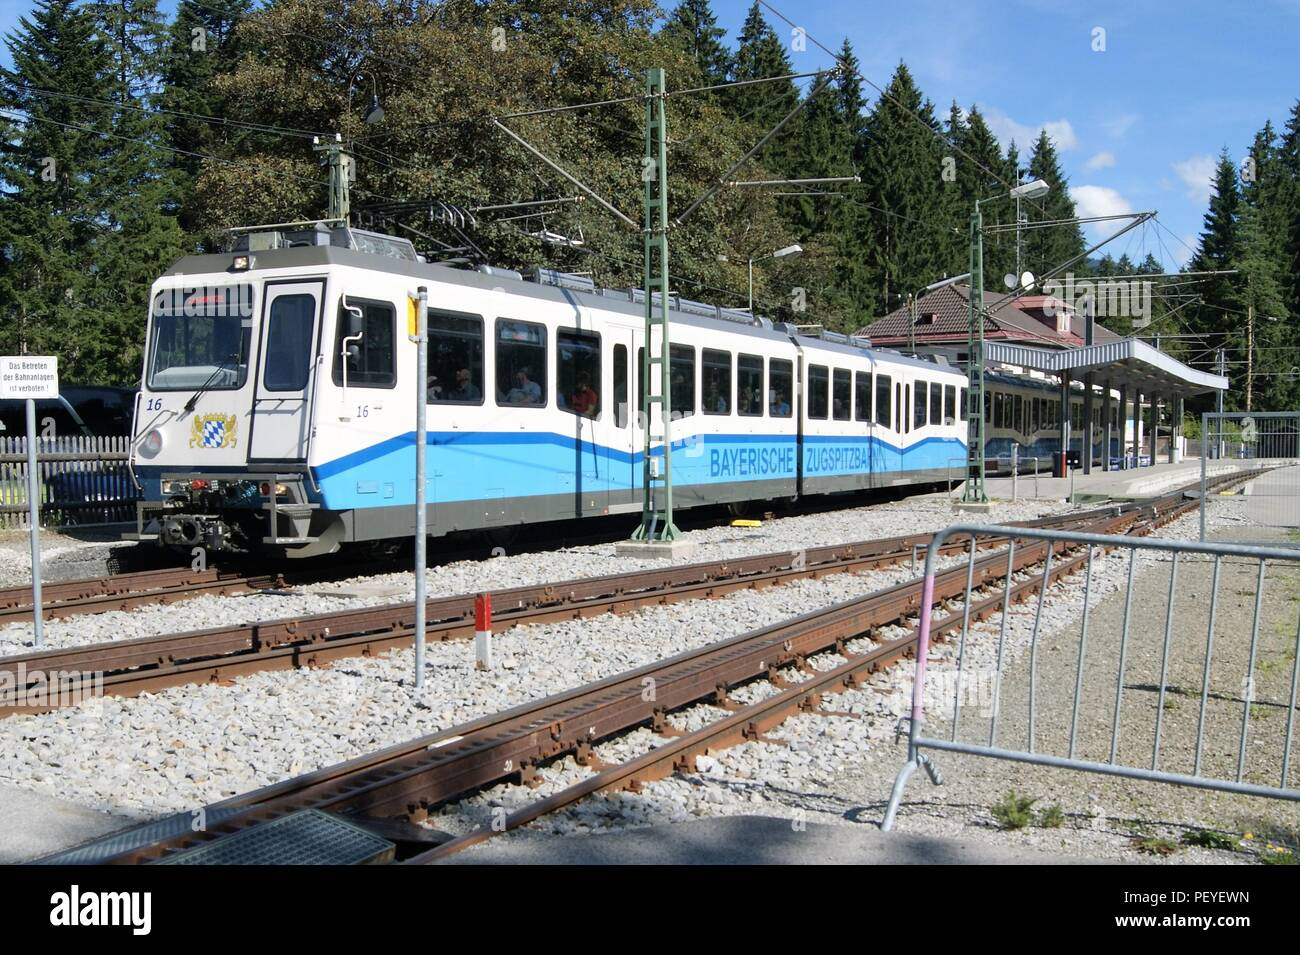 No 16 of the Bayerische Zugspitze Bahn calls at eibsee, bavaria - Stock Image